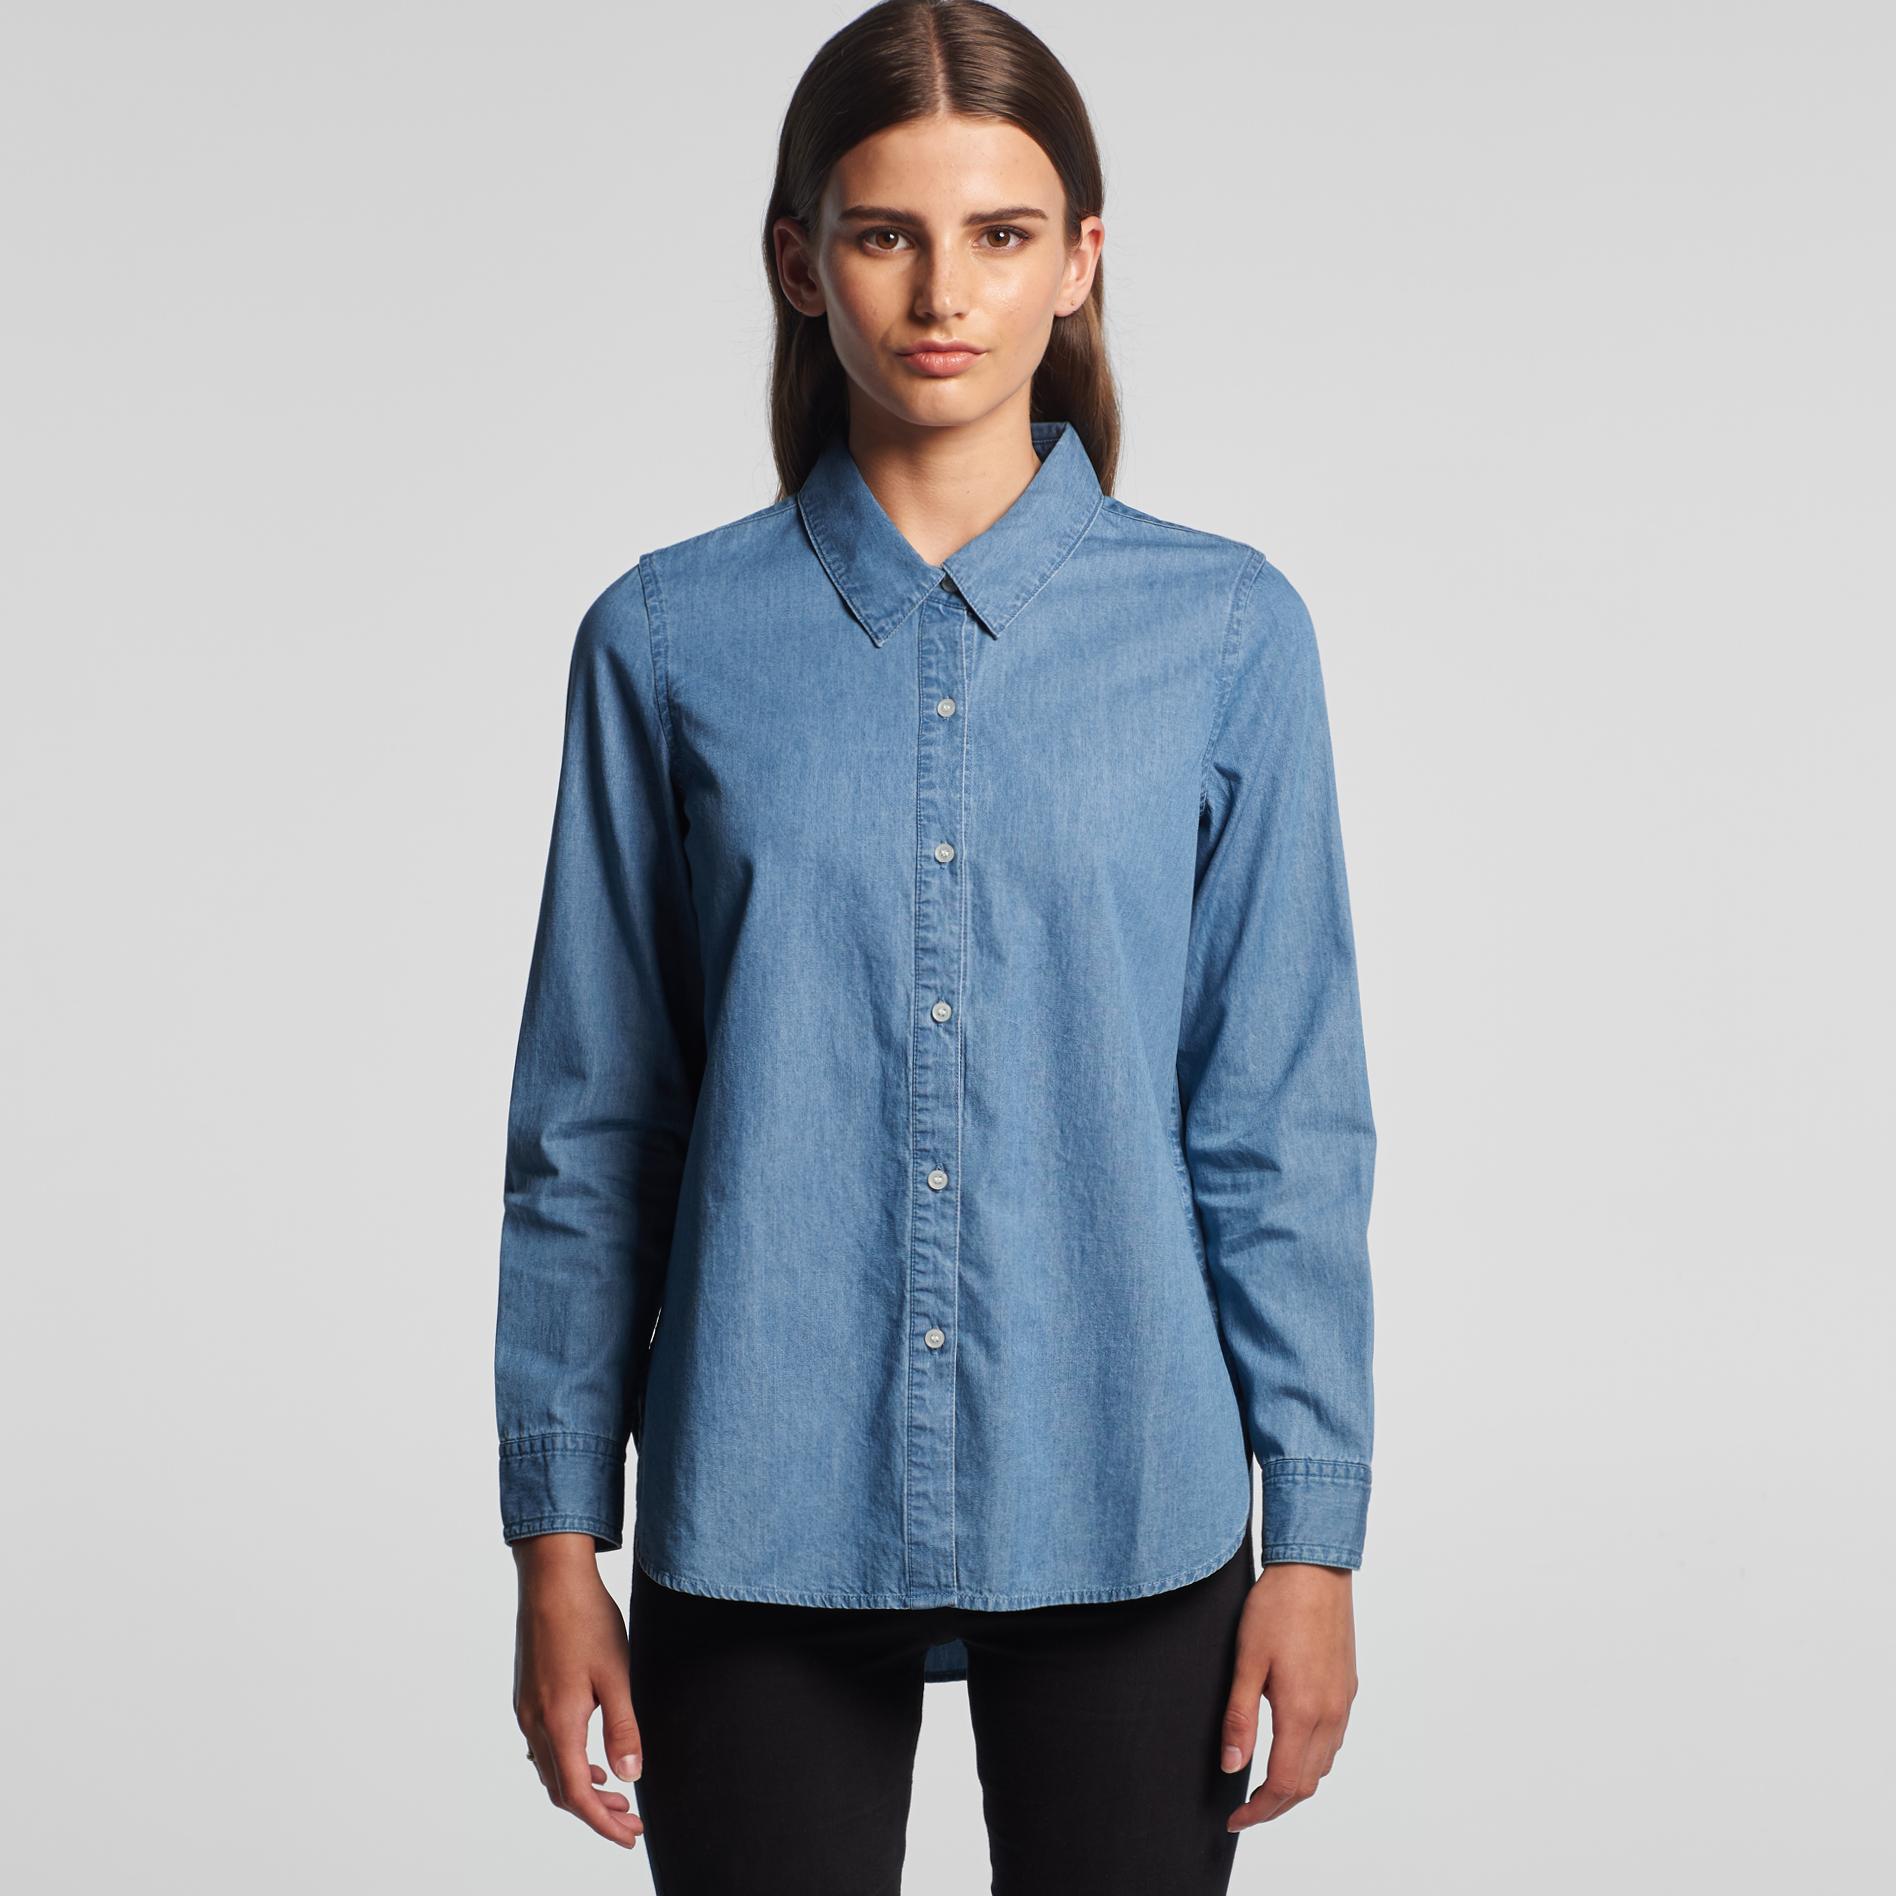 AS Colour Womens Blue Denim Shirt